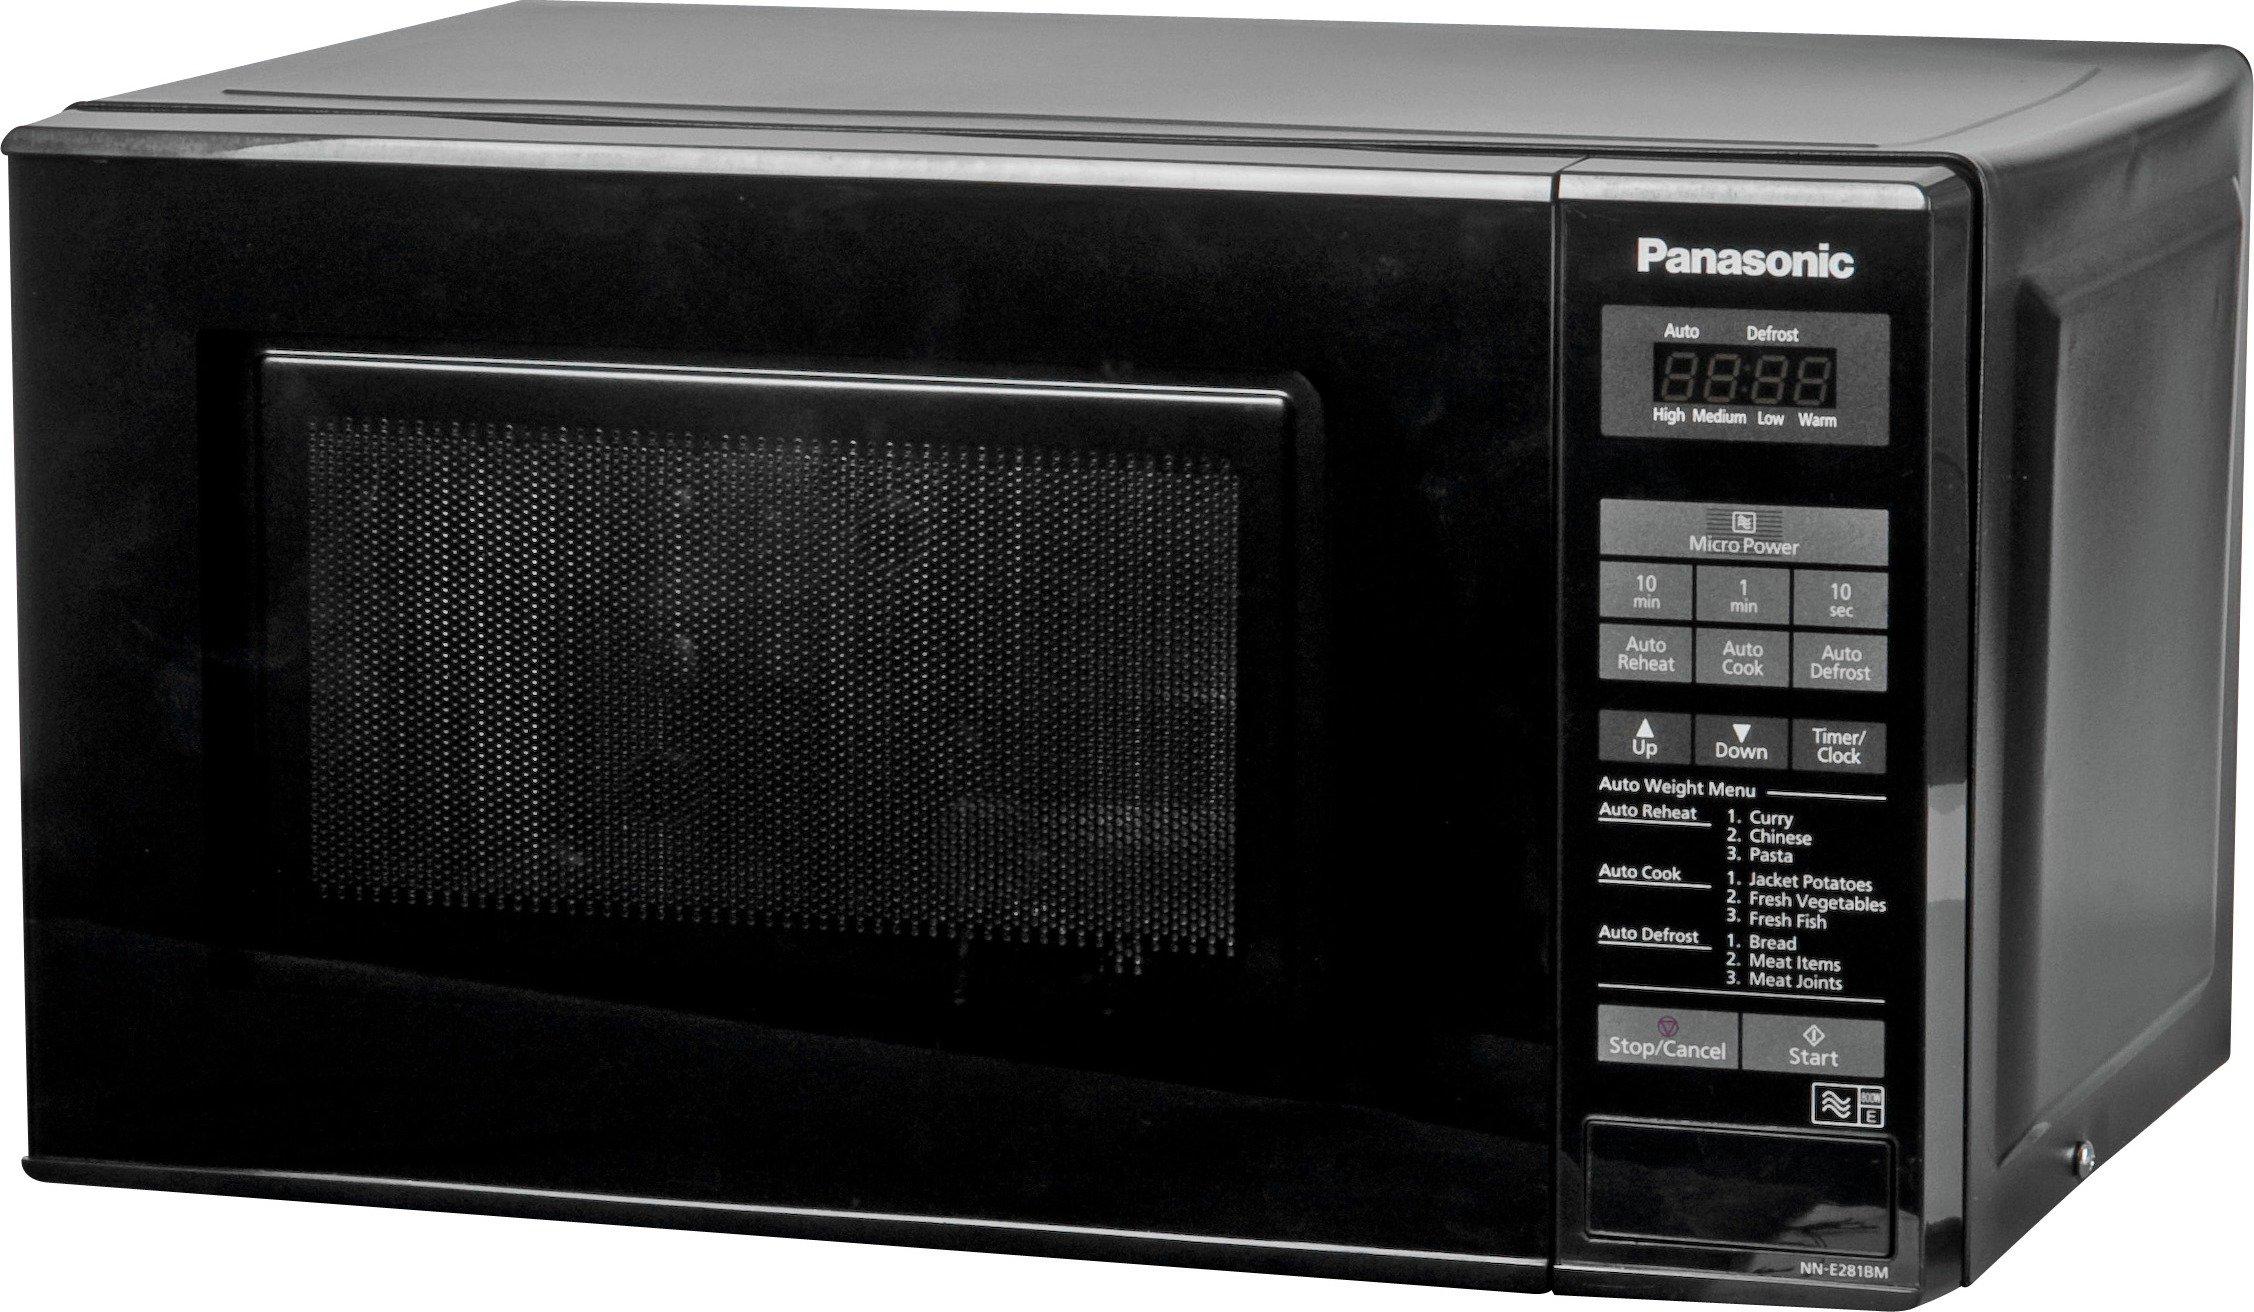 'Panasonic - Standard Microwave -nn-e281bmbpq -black